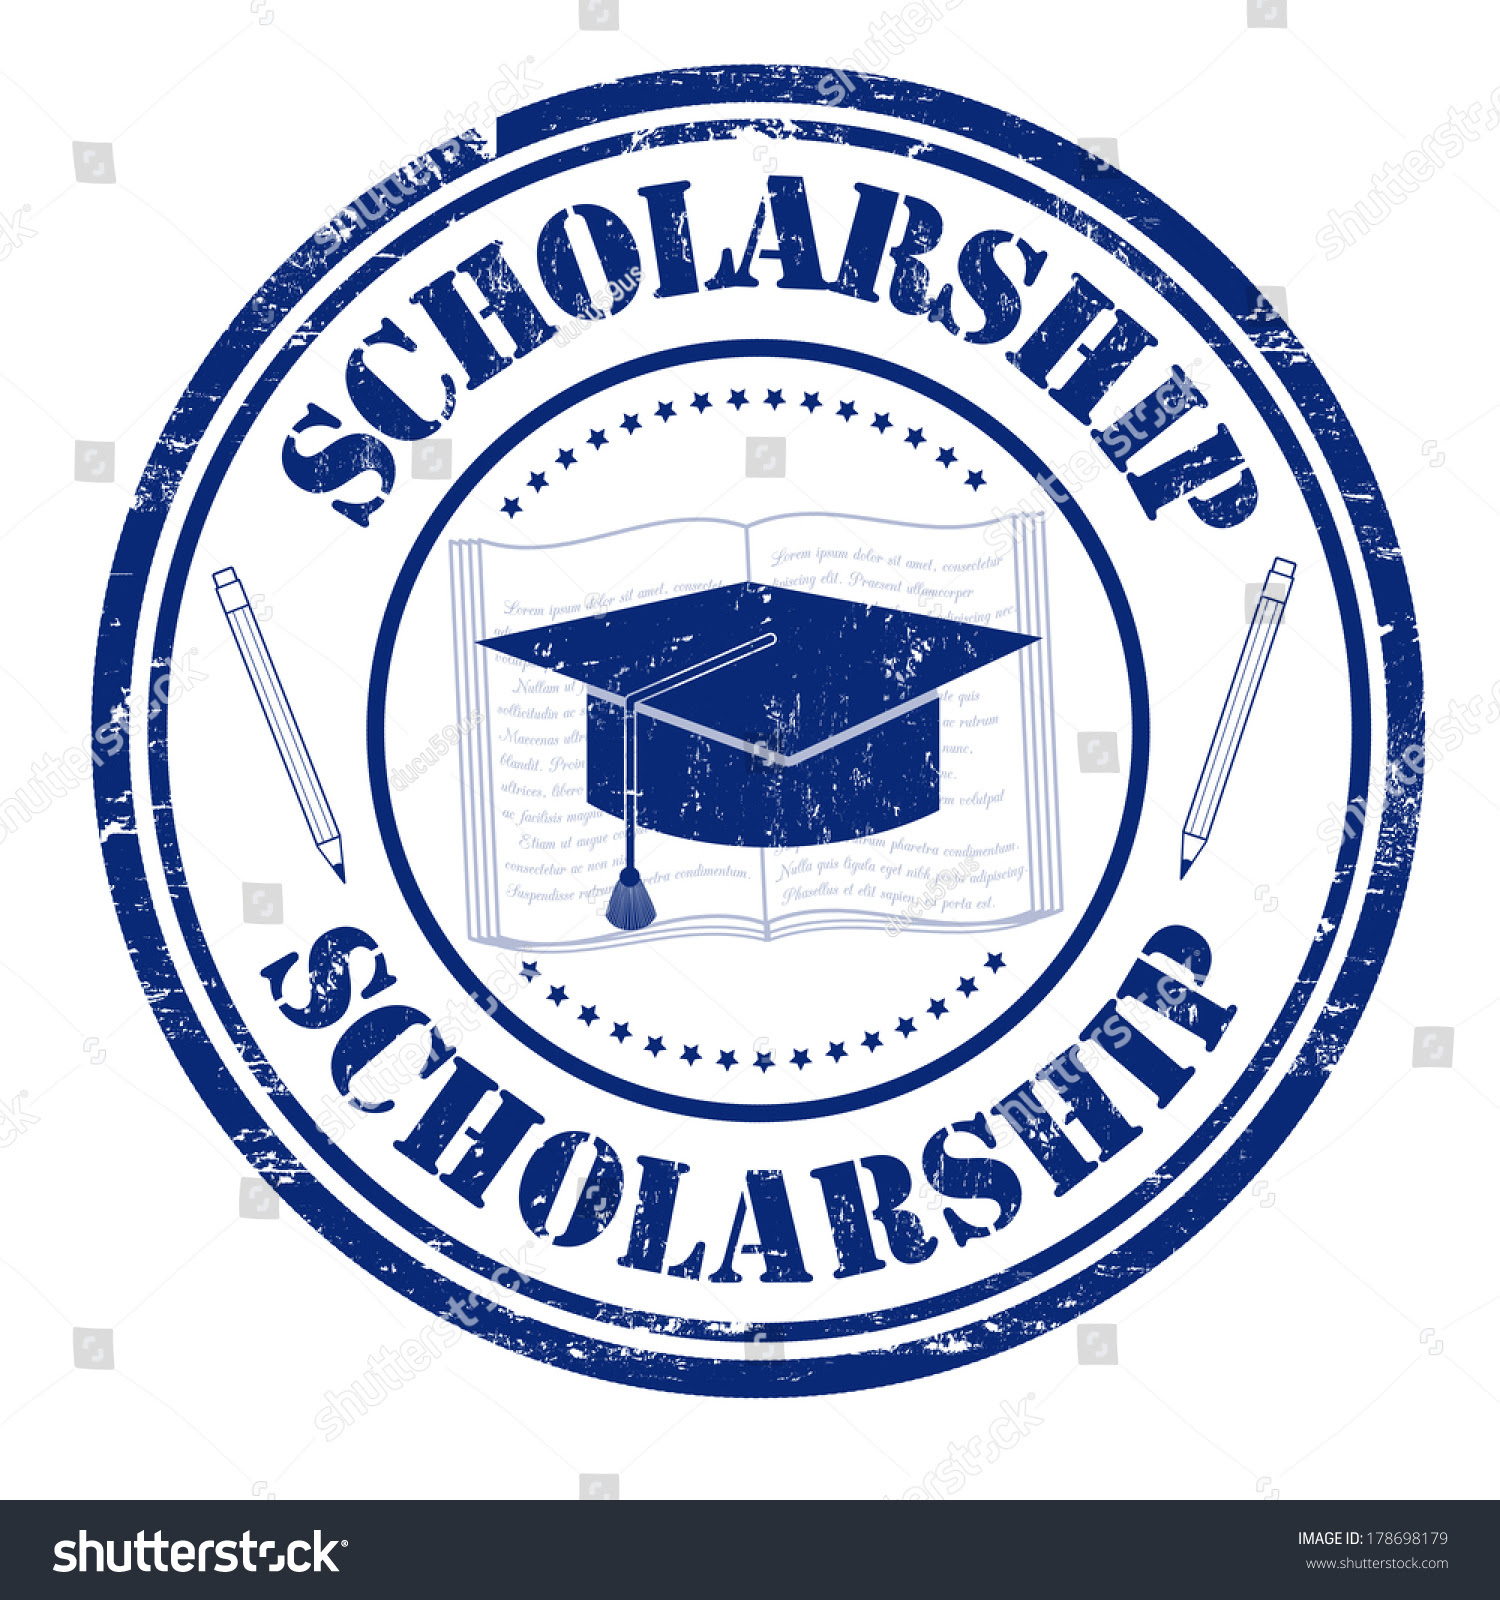 Scholarship Grunge Rubber Stamp On White Stock Vector ...